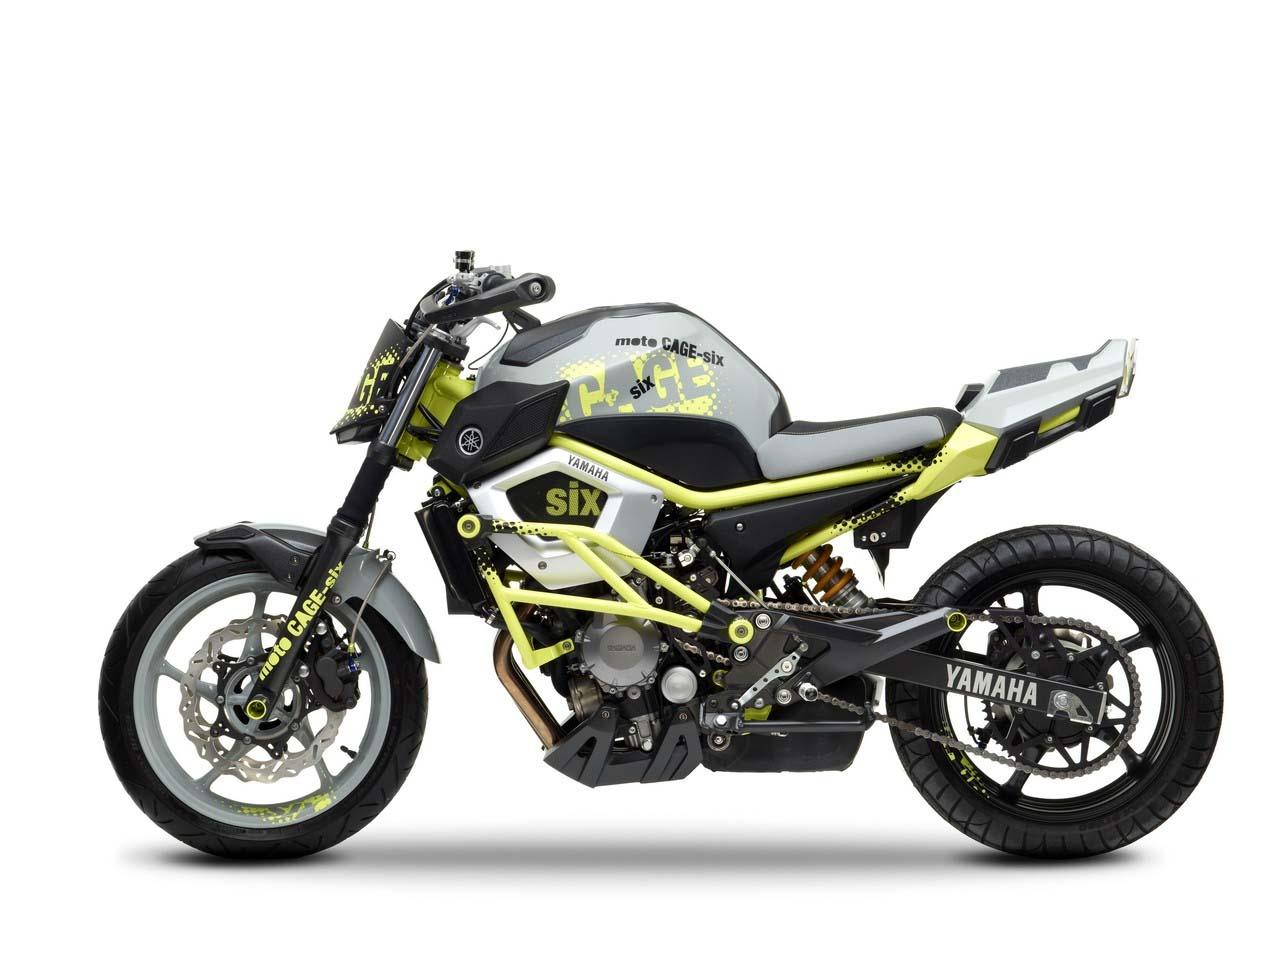 Yamaha Moto Cage Six Concept Asphalt Amp Rubber